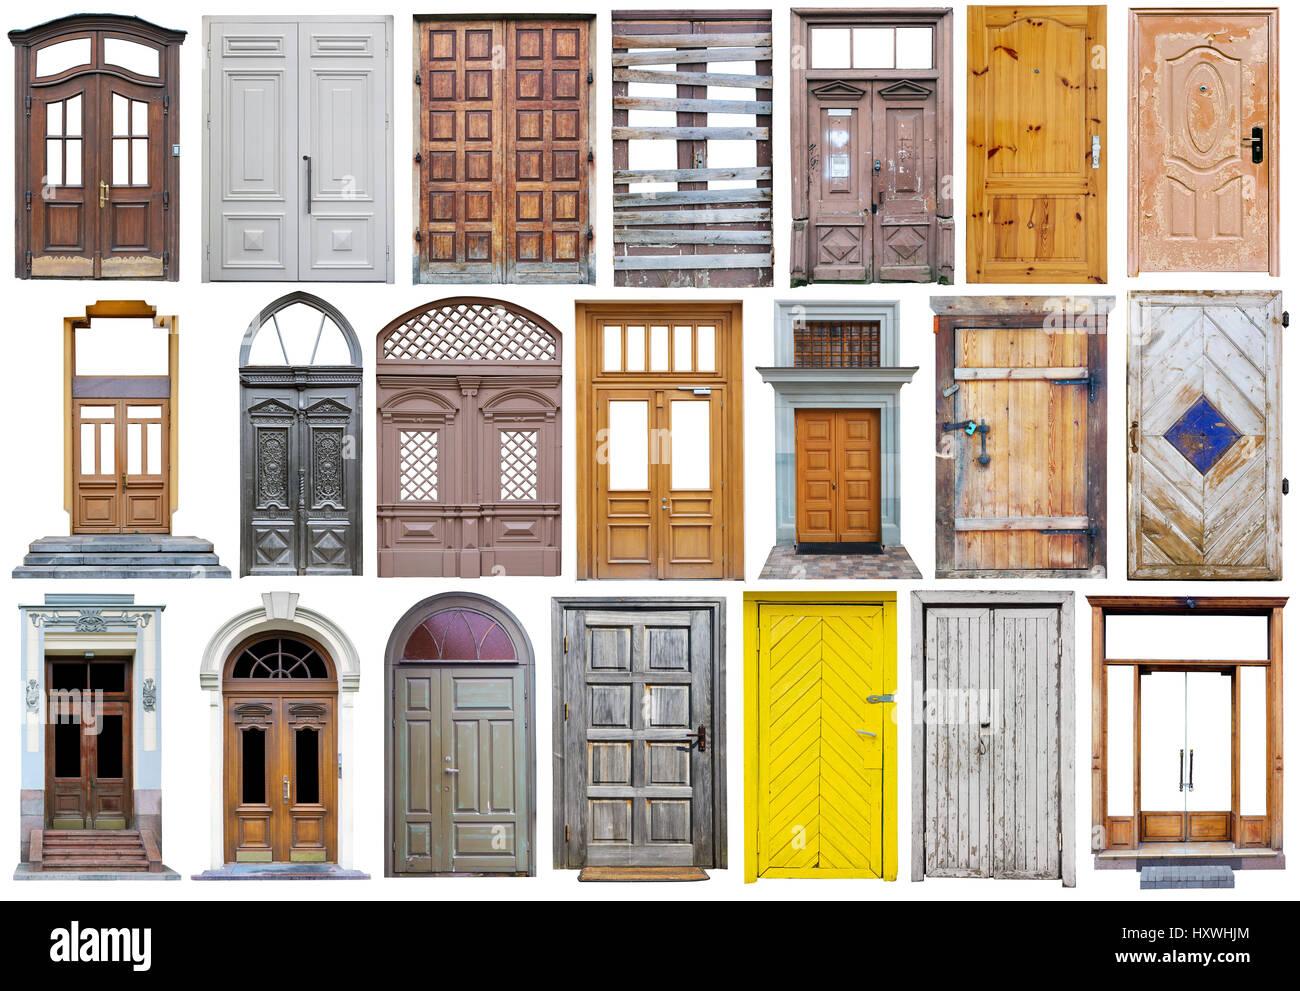 Modern Wooden Street Doors In Vintage Retro Style Big Set Collage